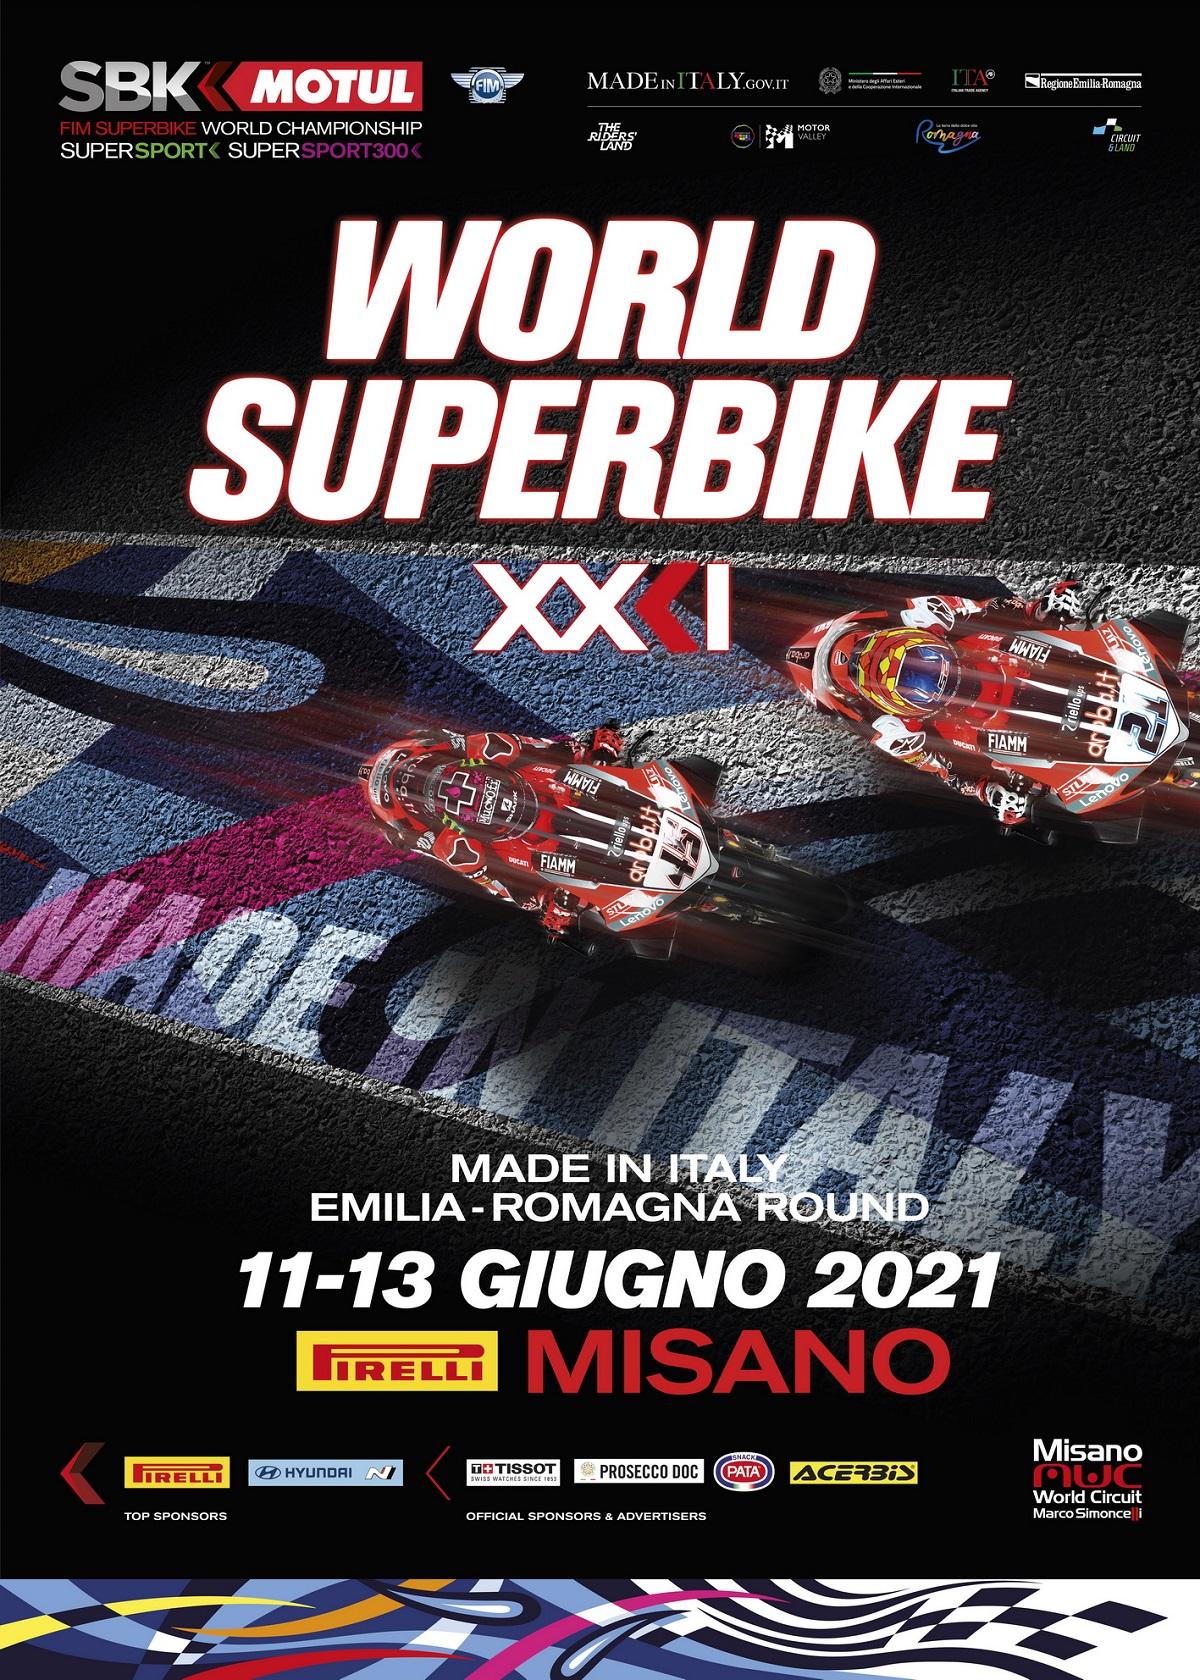 Pirelli Made in Italy & Emilia-Romagna Round al MWC